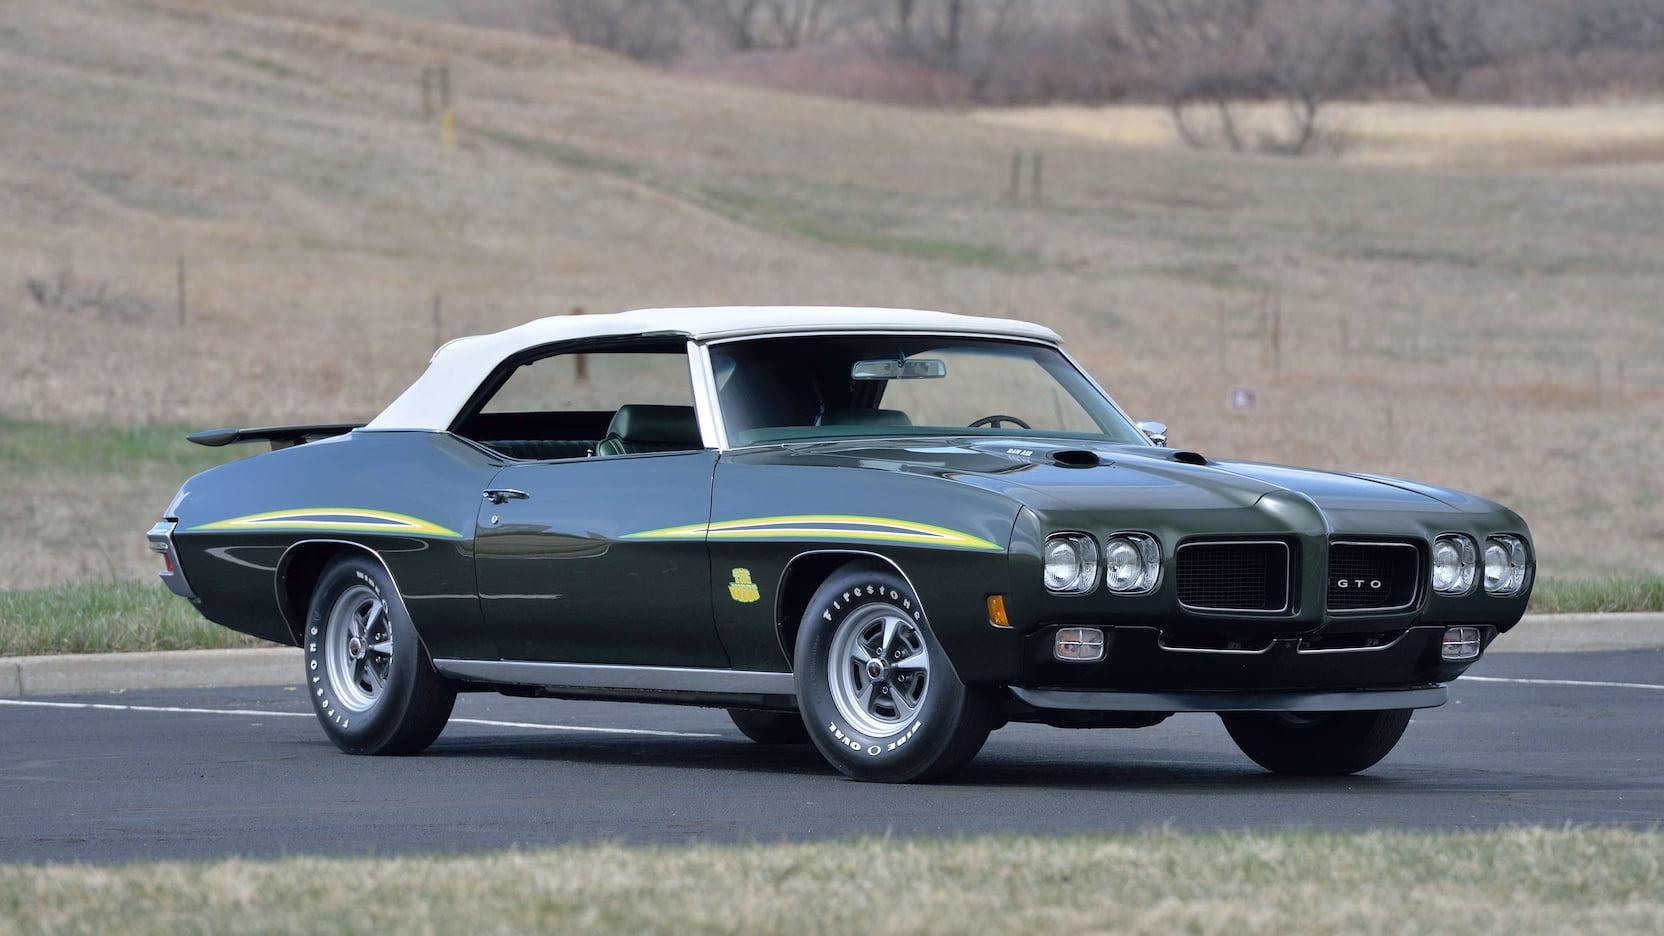 1970 Pontiac GTO Judge Convertible Front 3/4